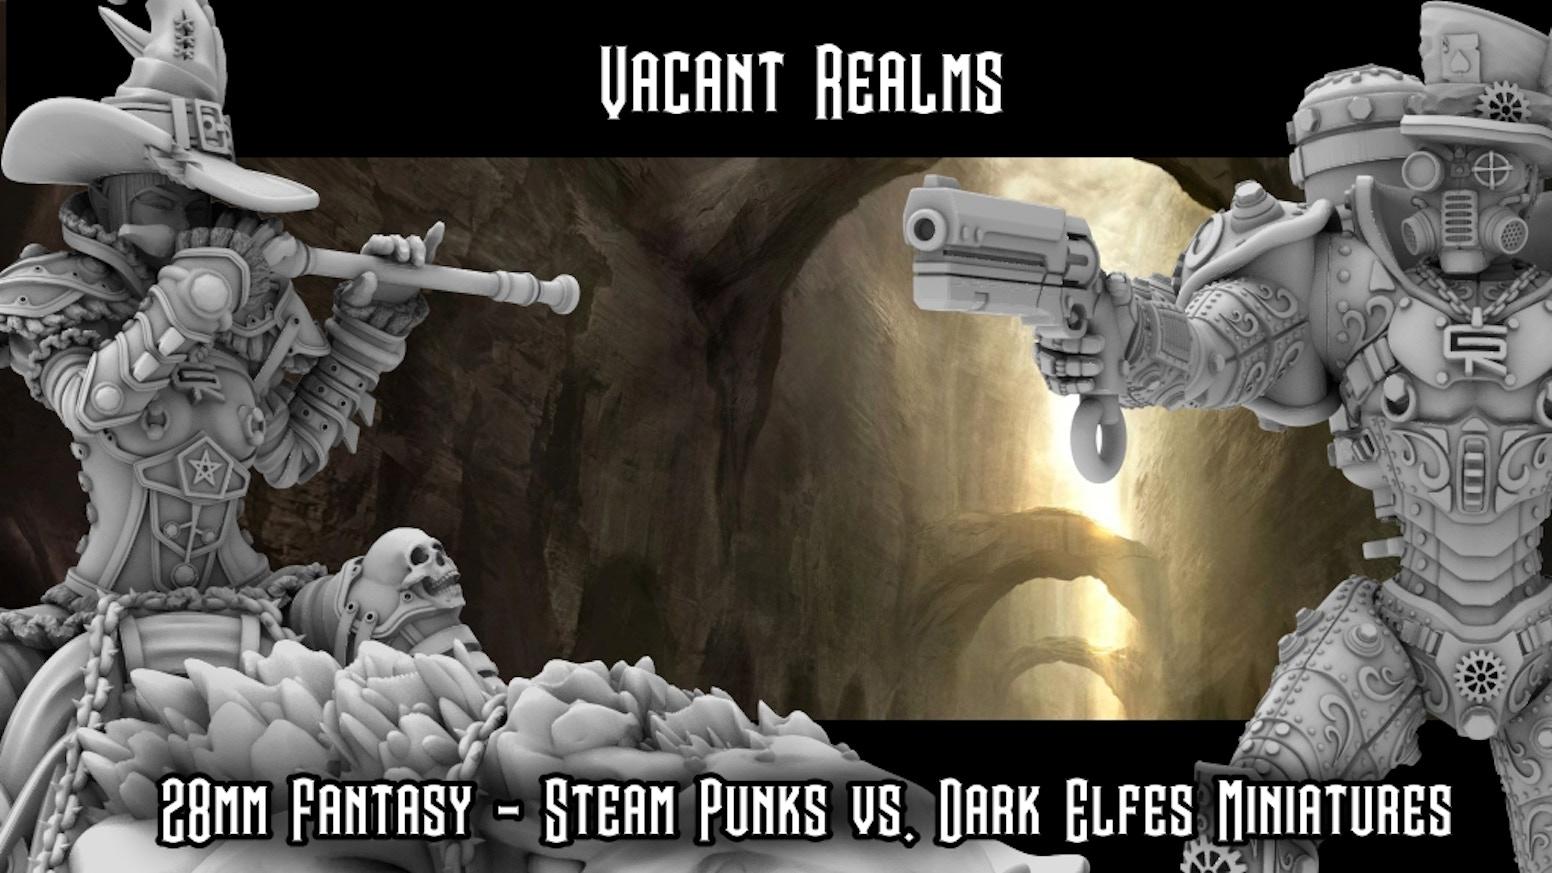 28mm Fantasy - Steam Punks vs. Dark Elfes Miniatures